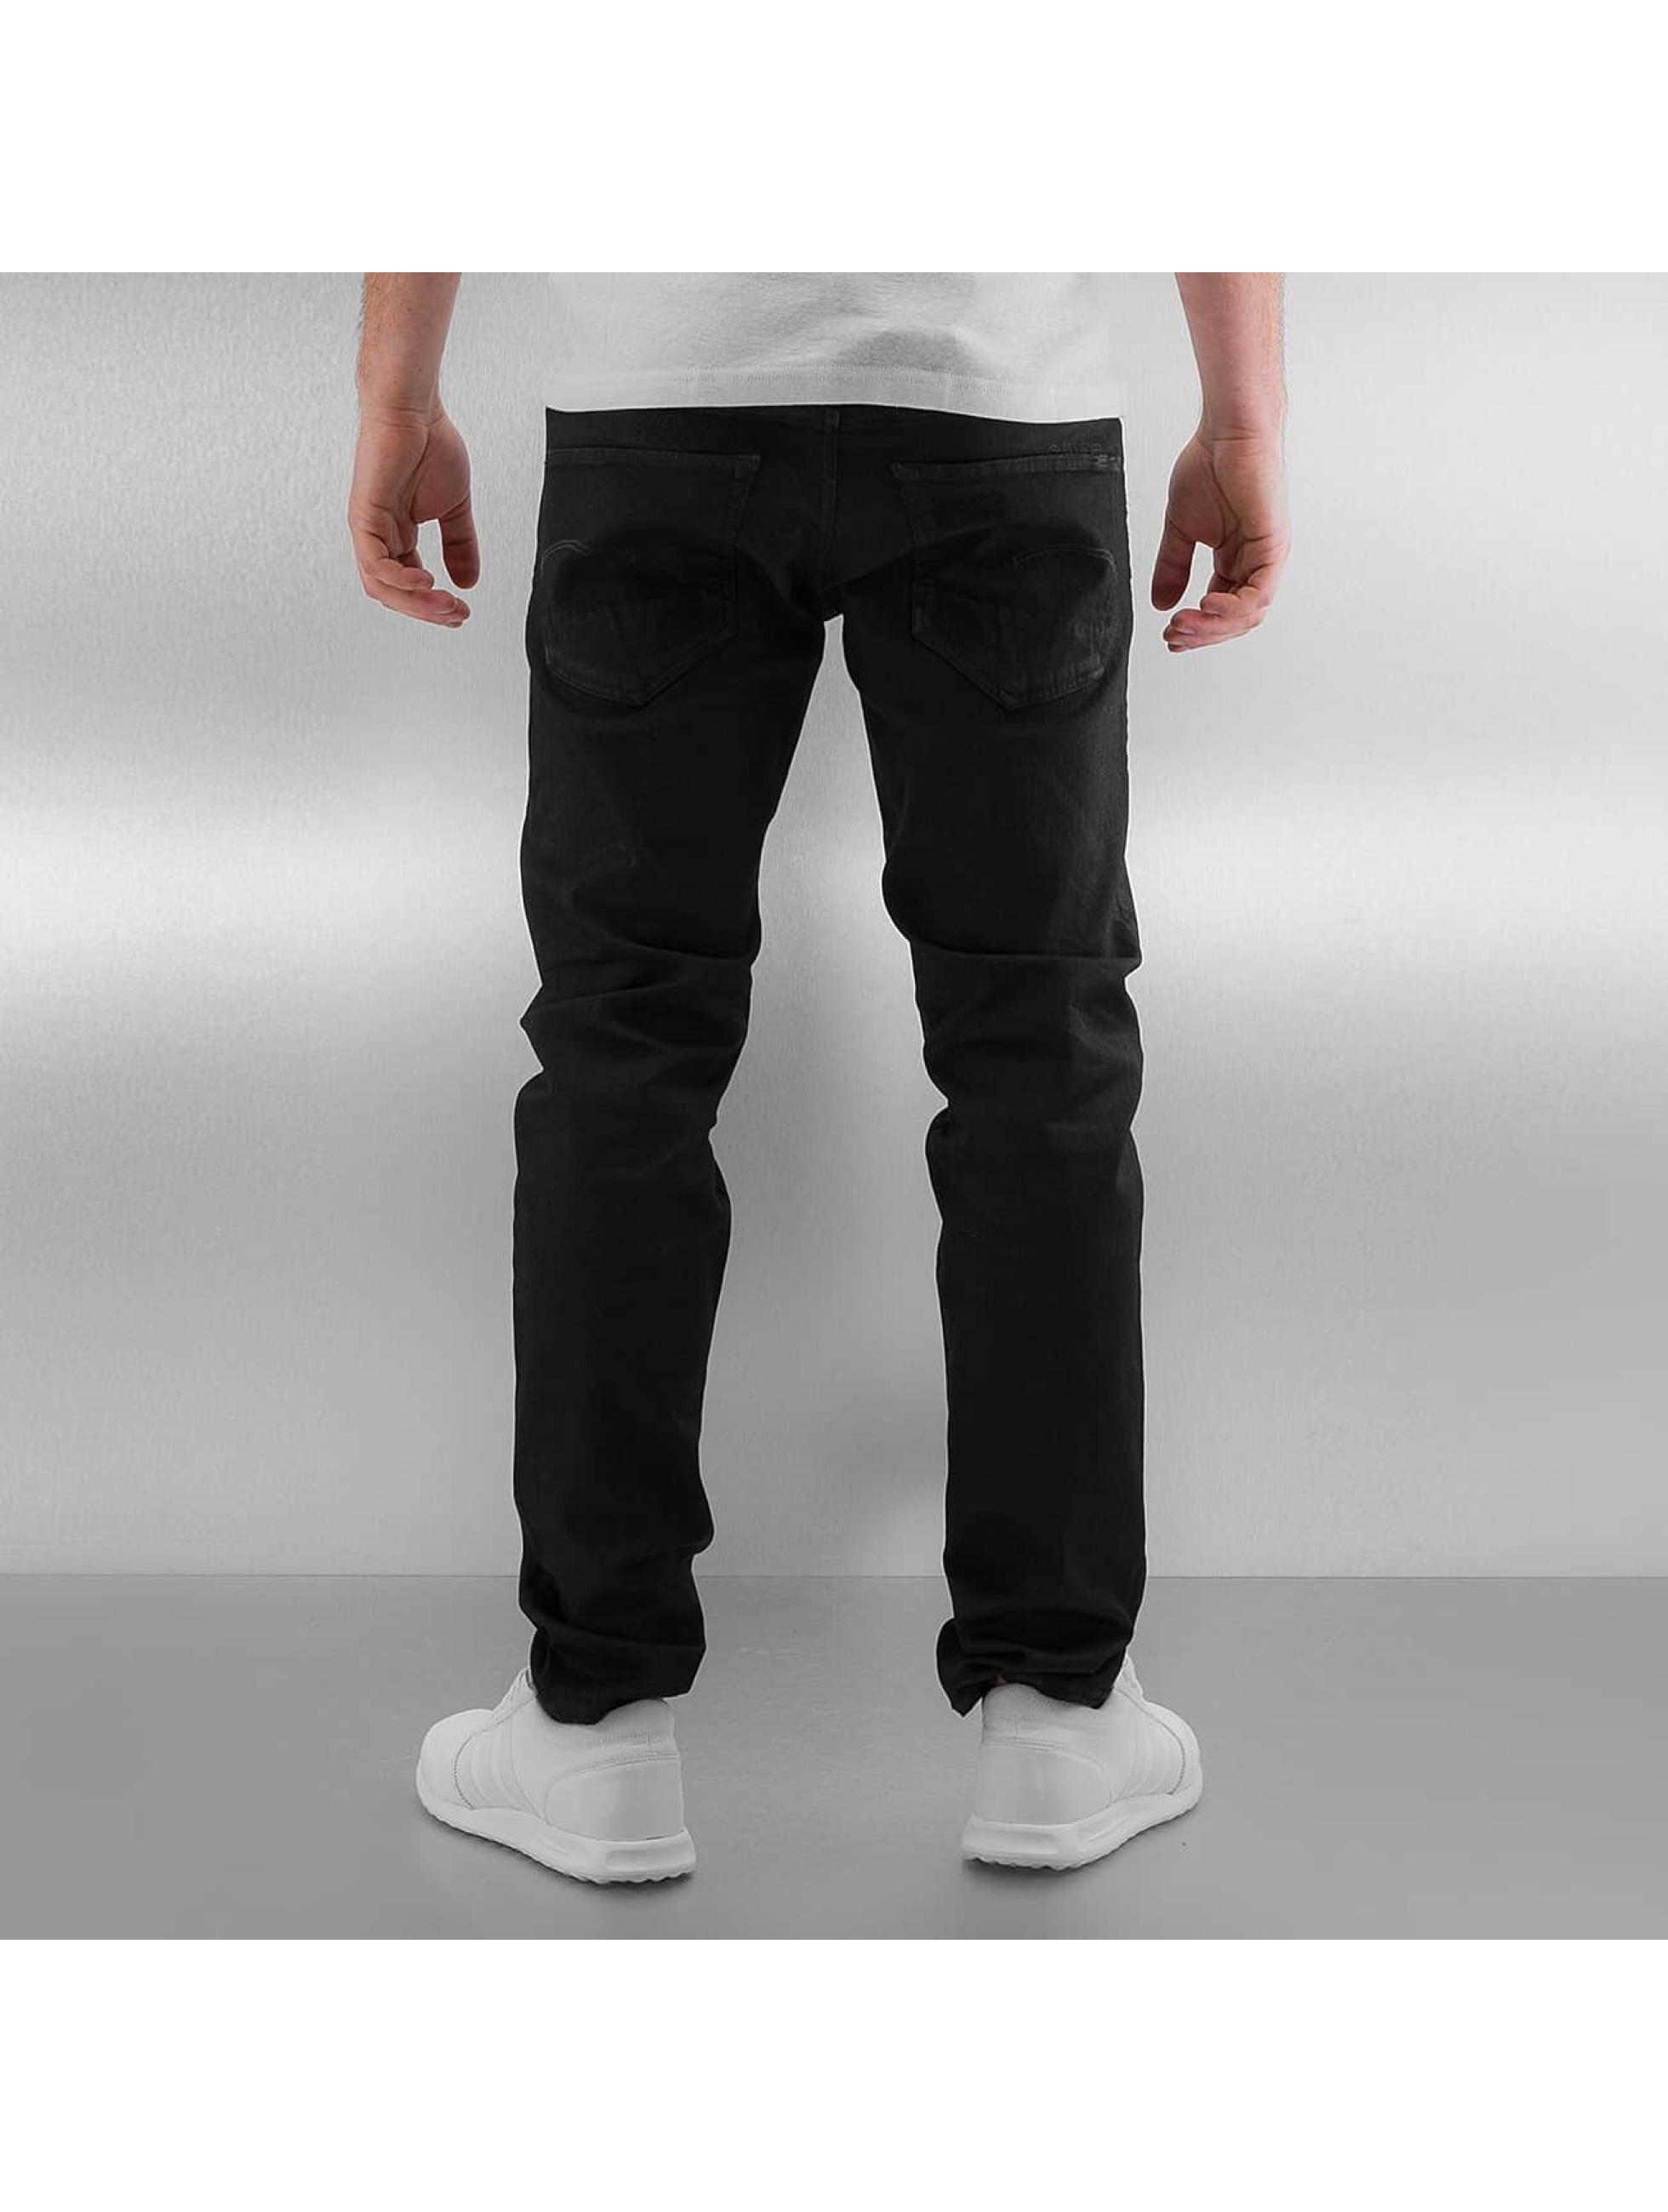 G-Star Jean coupe droite 3301 Slim Turner noir